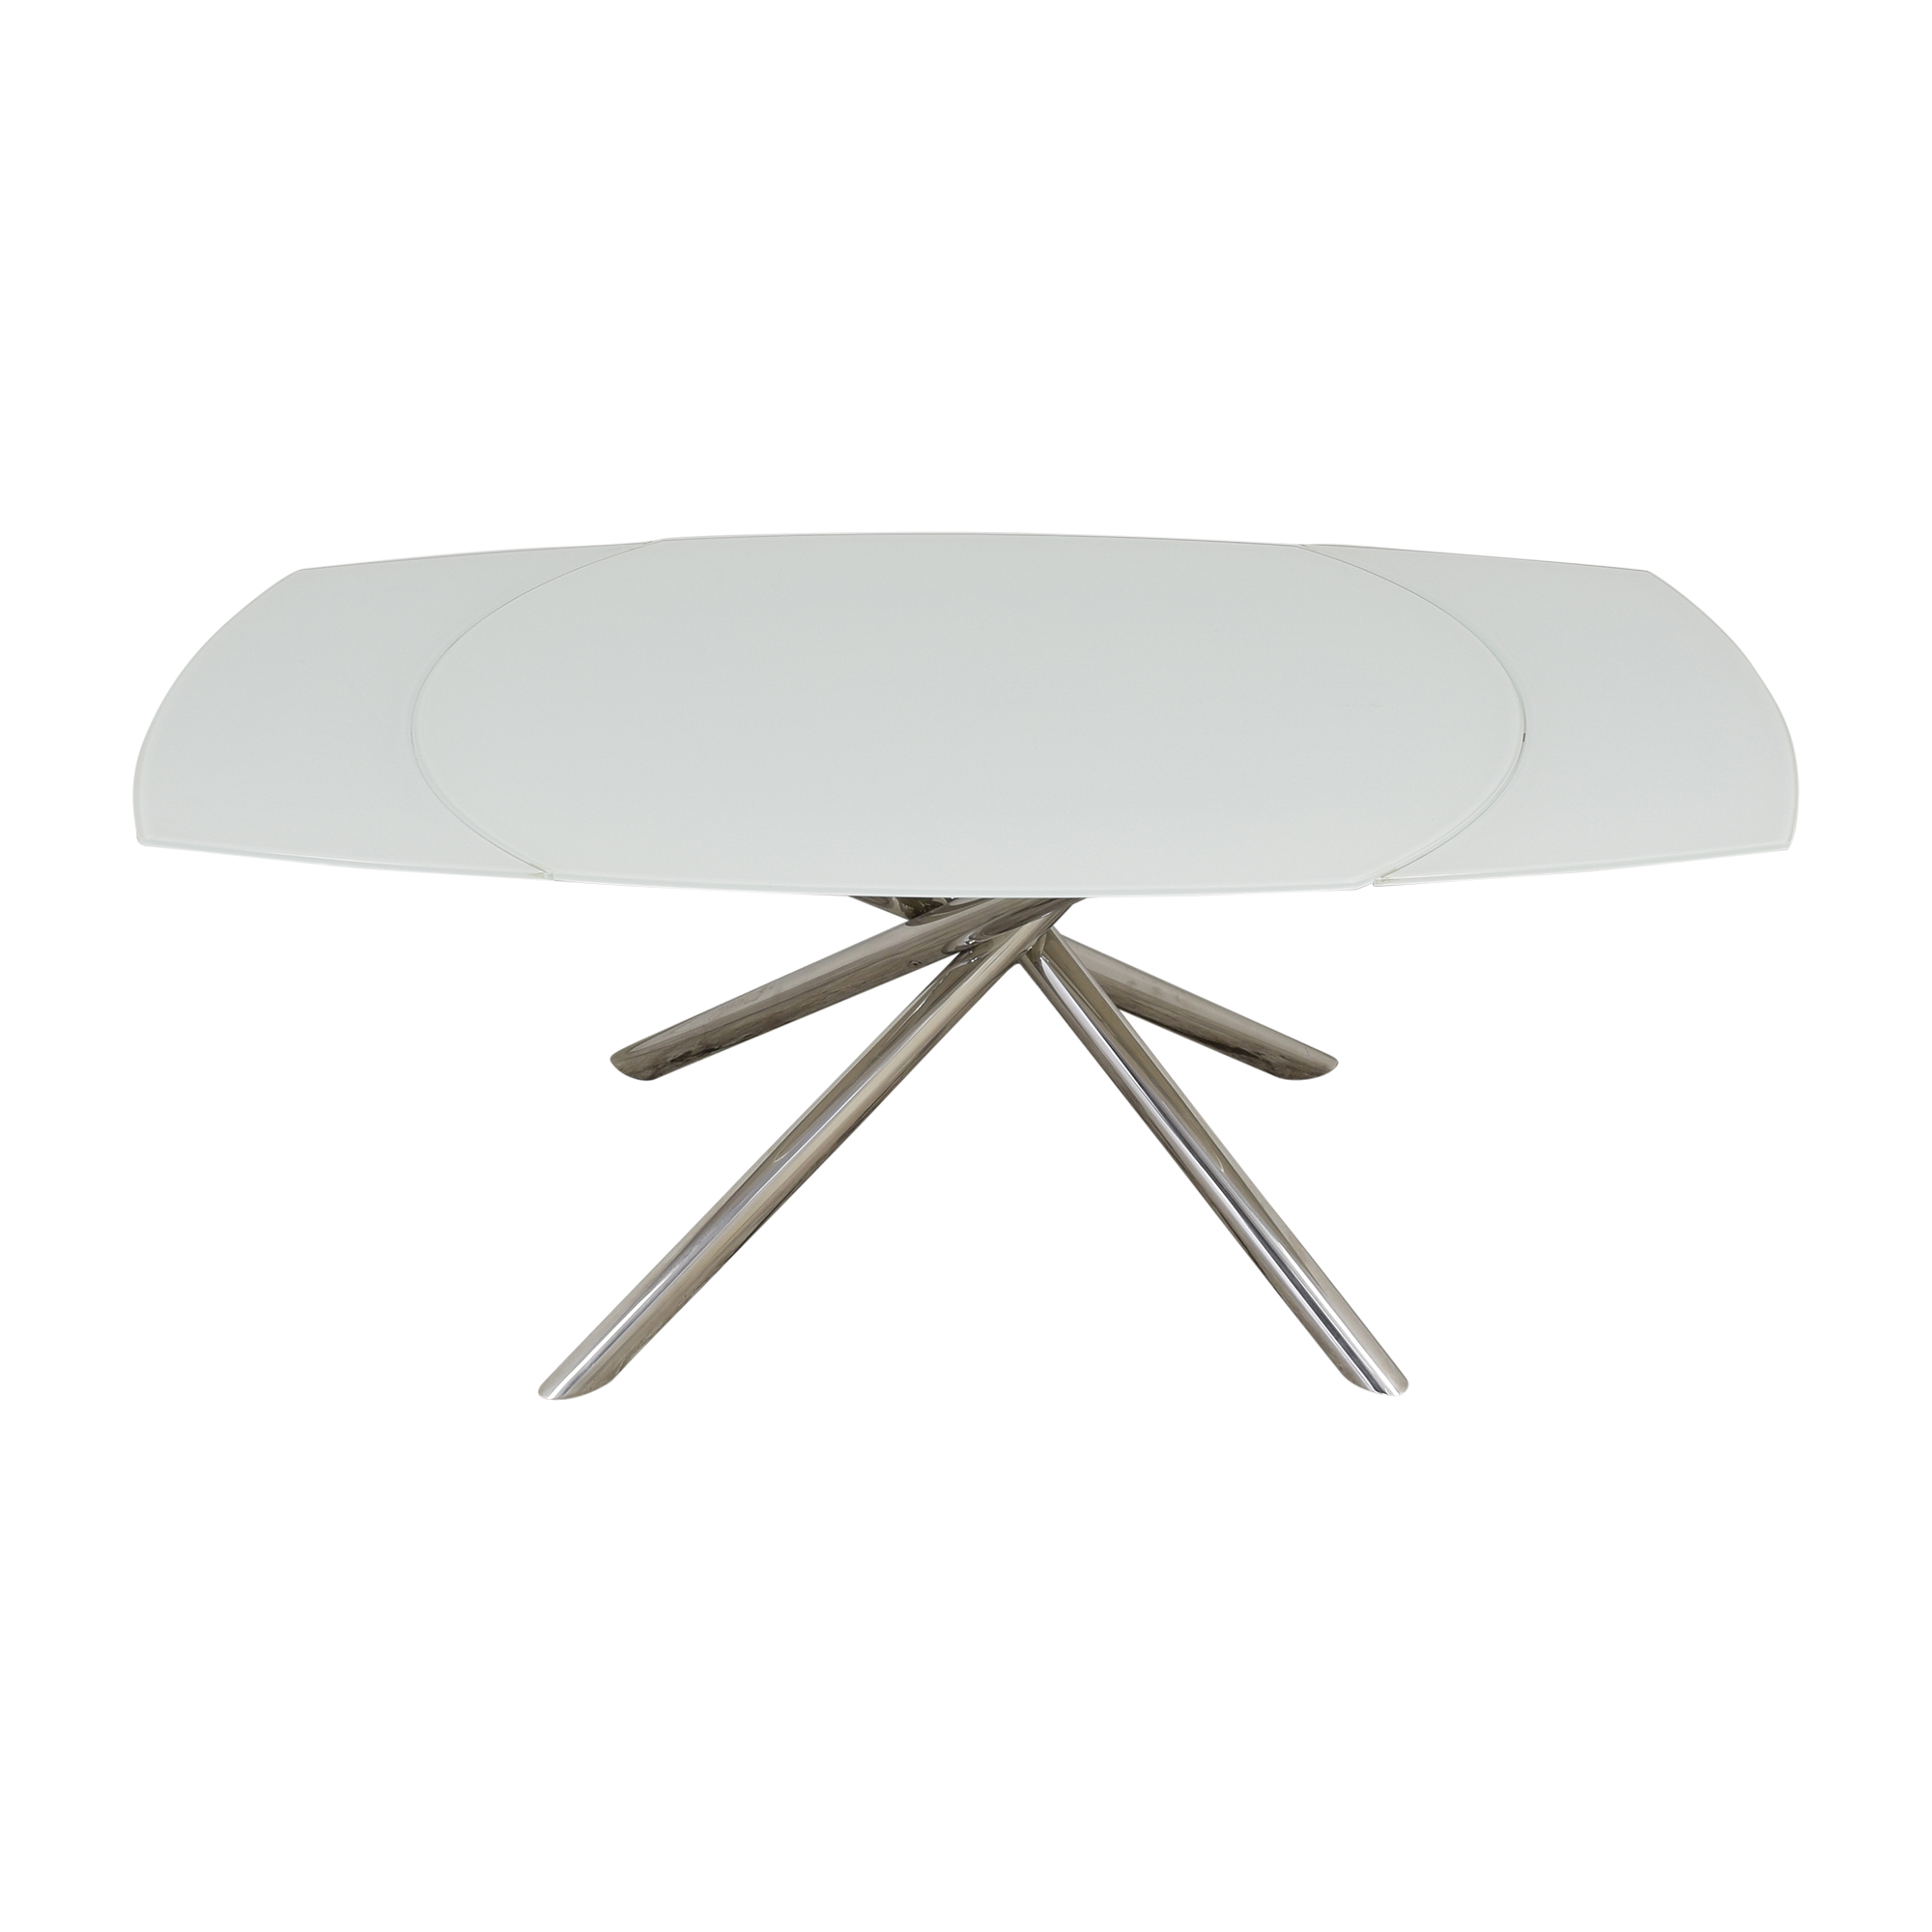 Modani Modani Astro Extendable Dining Table ct